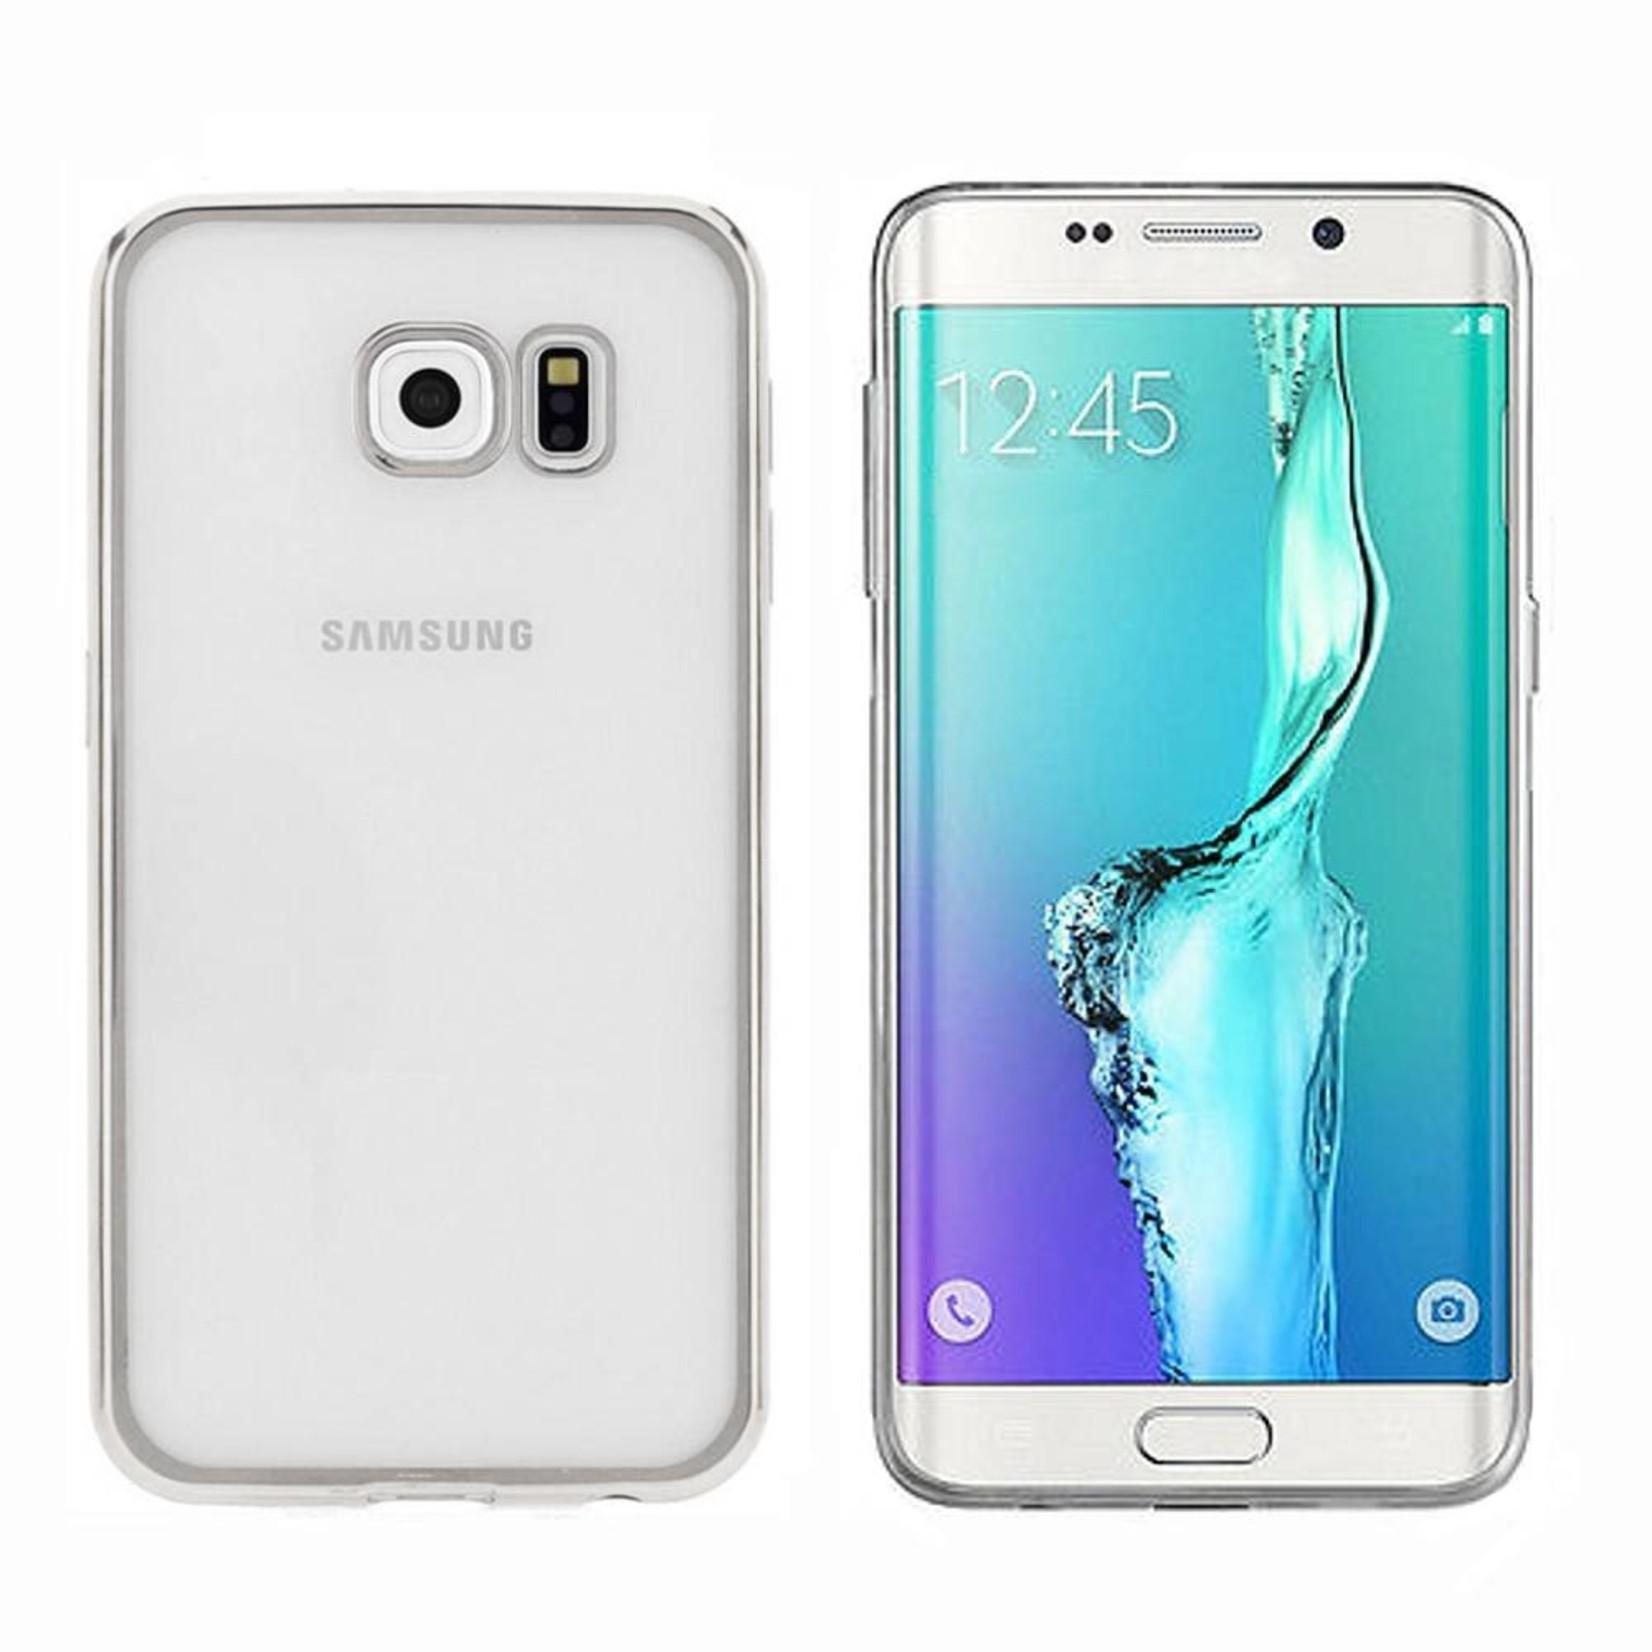 Colorfone Hoesje CoolSkin Bumper Clear Samsung Galaxy S6 Edge Plus Zilver